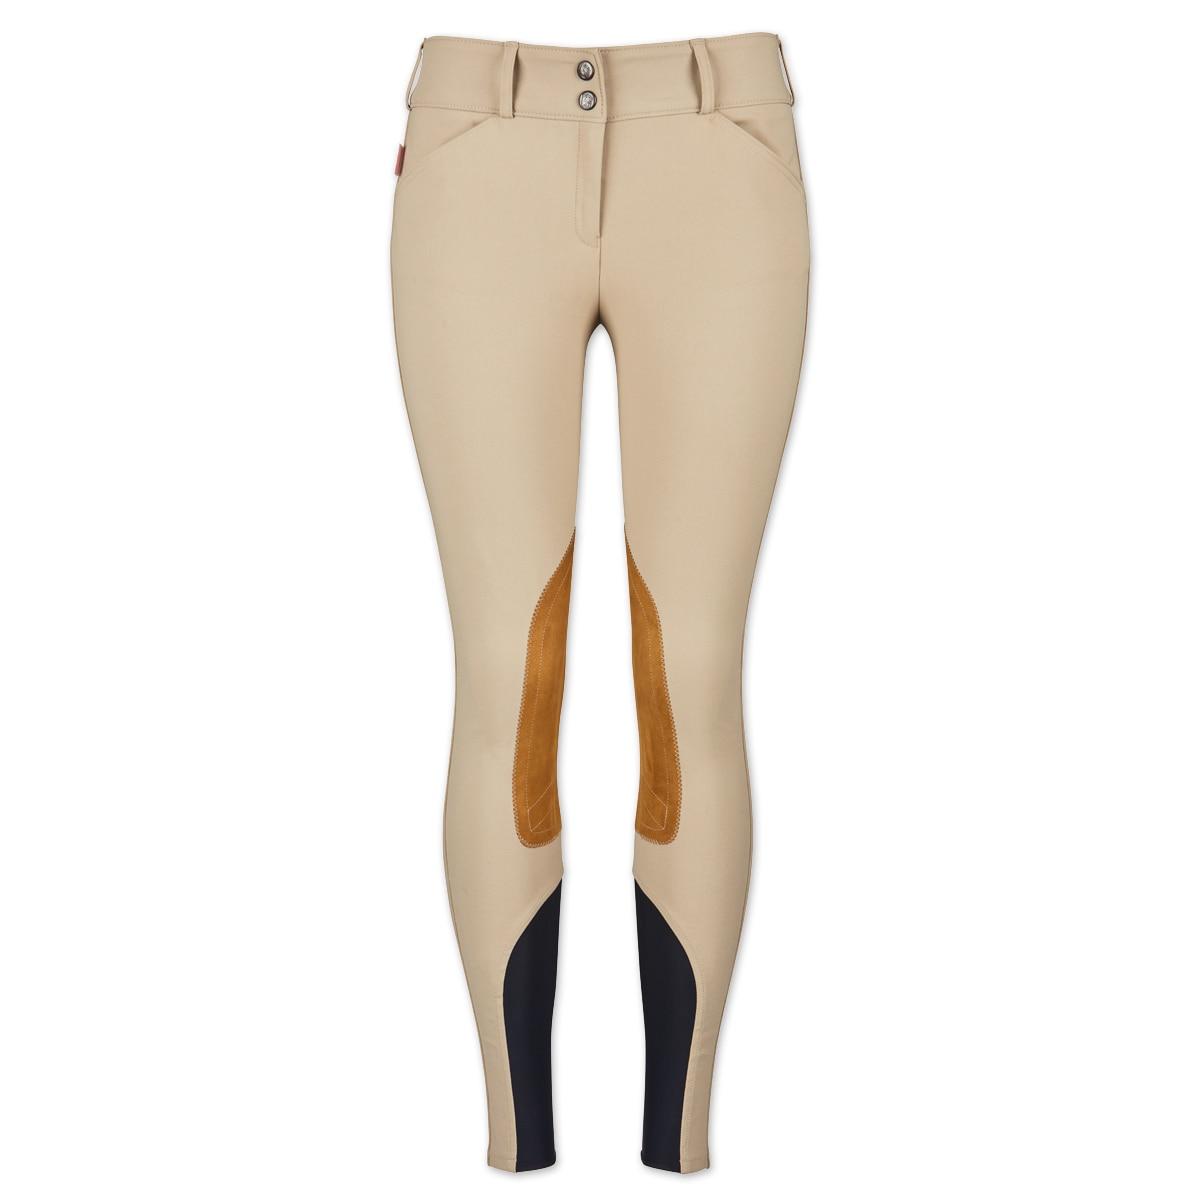 Tailored Sportsman Ladies Sock Bottom Breeches Bordeaux Front Zip Low Rise